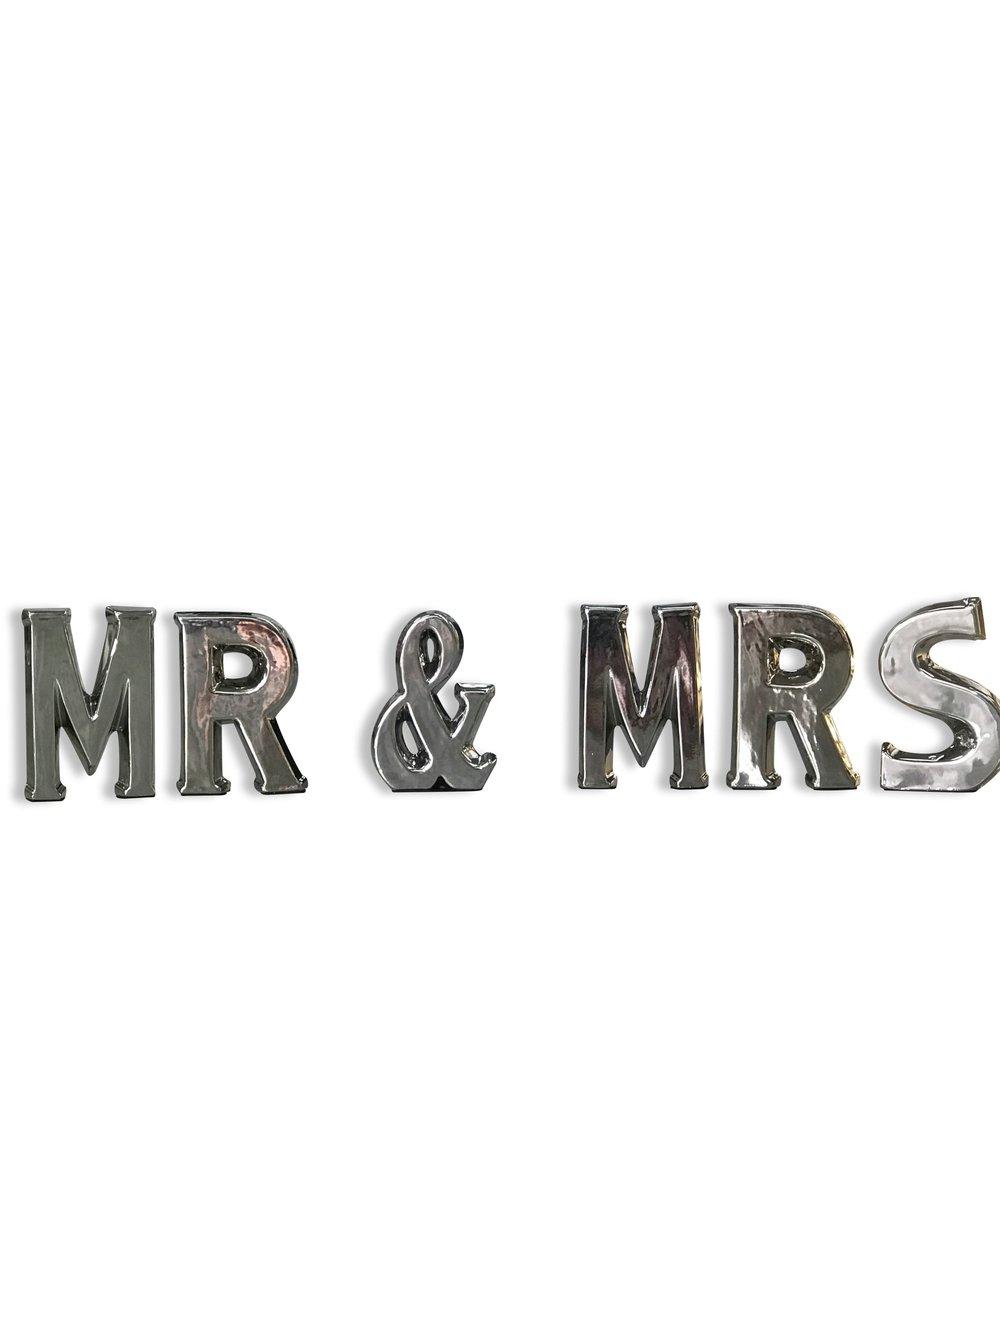 Mr & Mrs Tabletop Letters